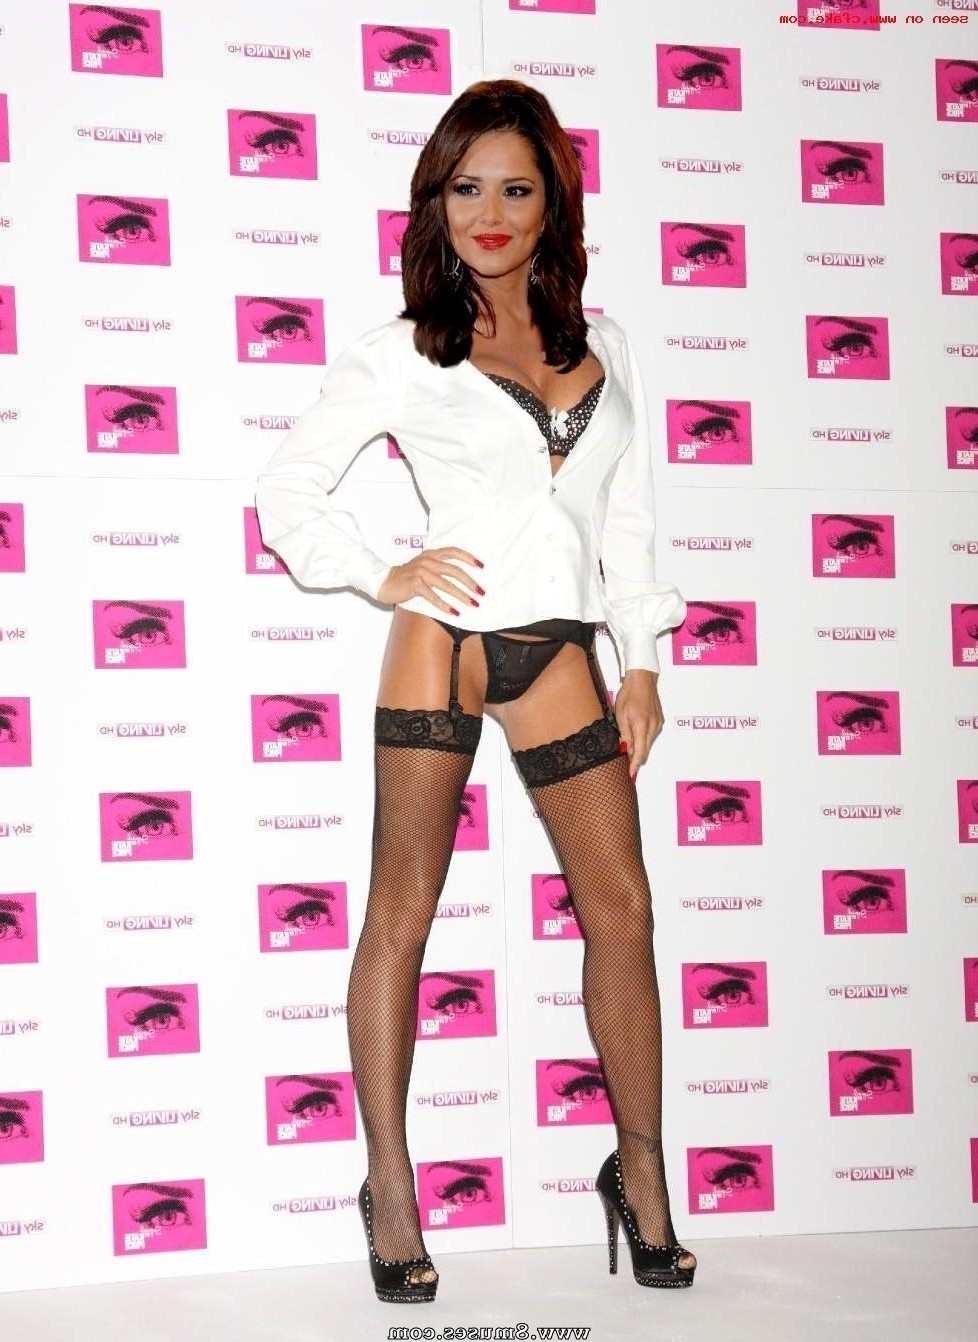 Fake-Celebrities-Sex-Pictures/Cheryl-Tweedy Cheryl__Tweedy__8muses_-_Sex_and_Porn_Comics_6.jpg